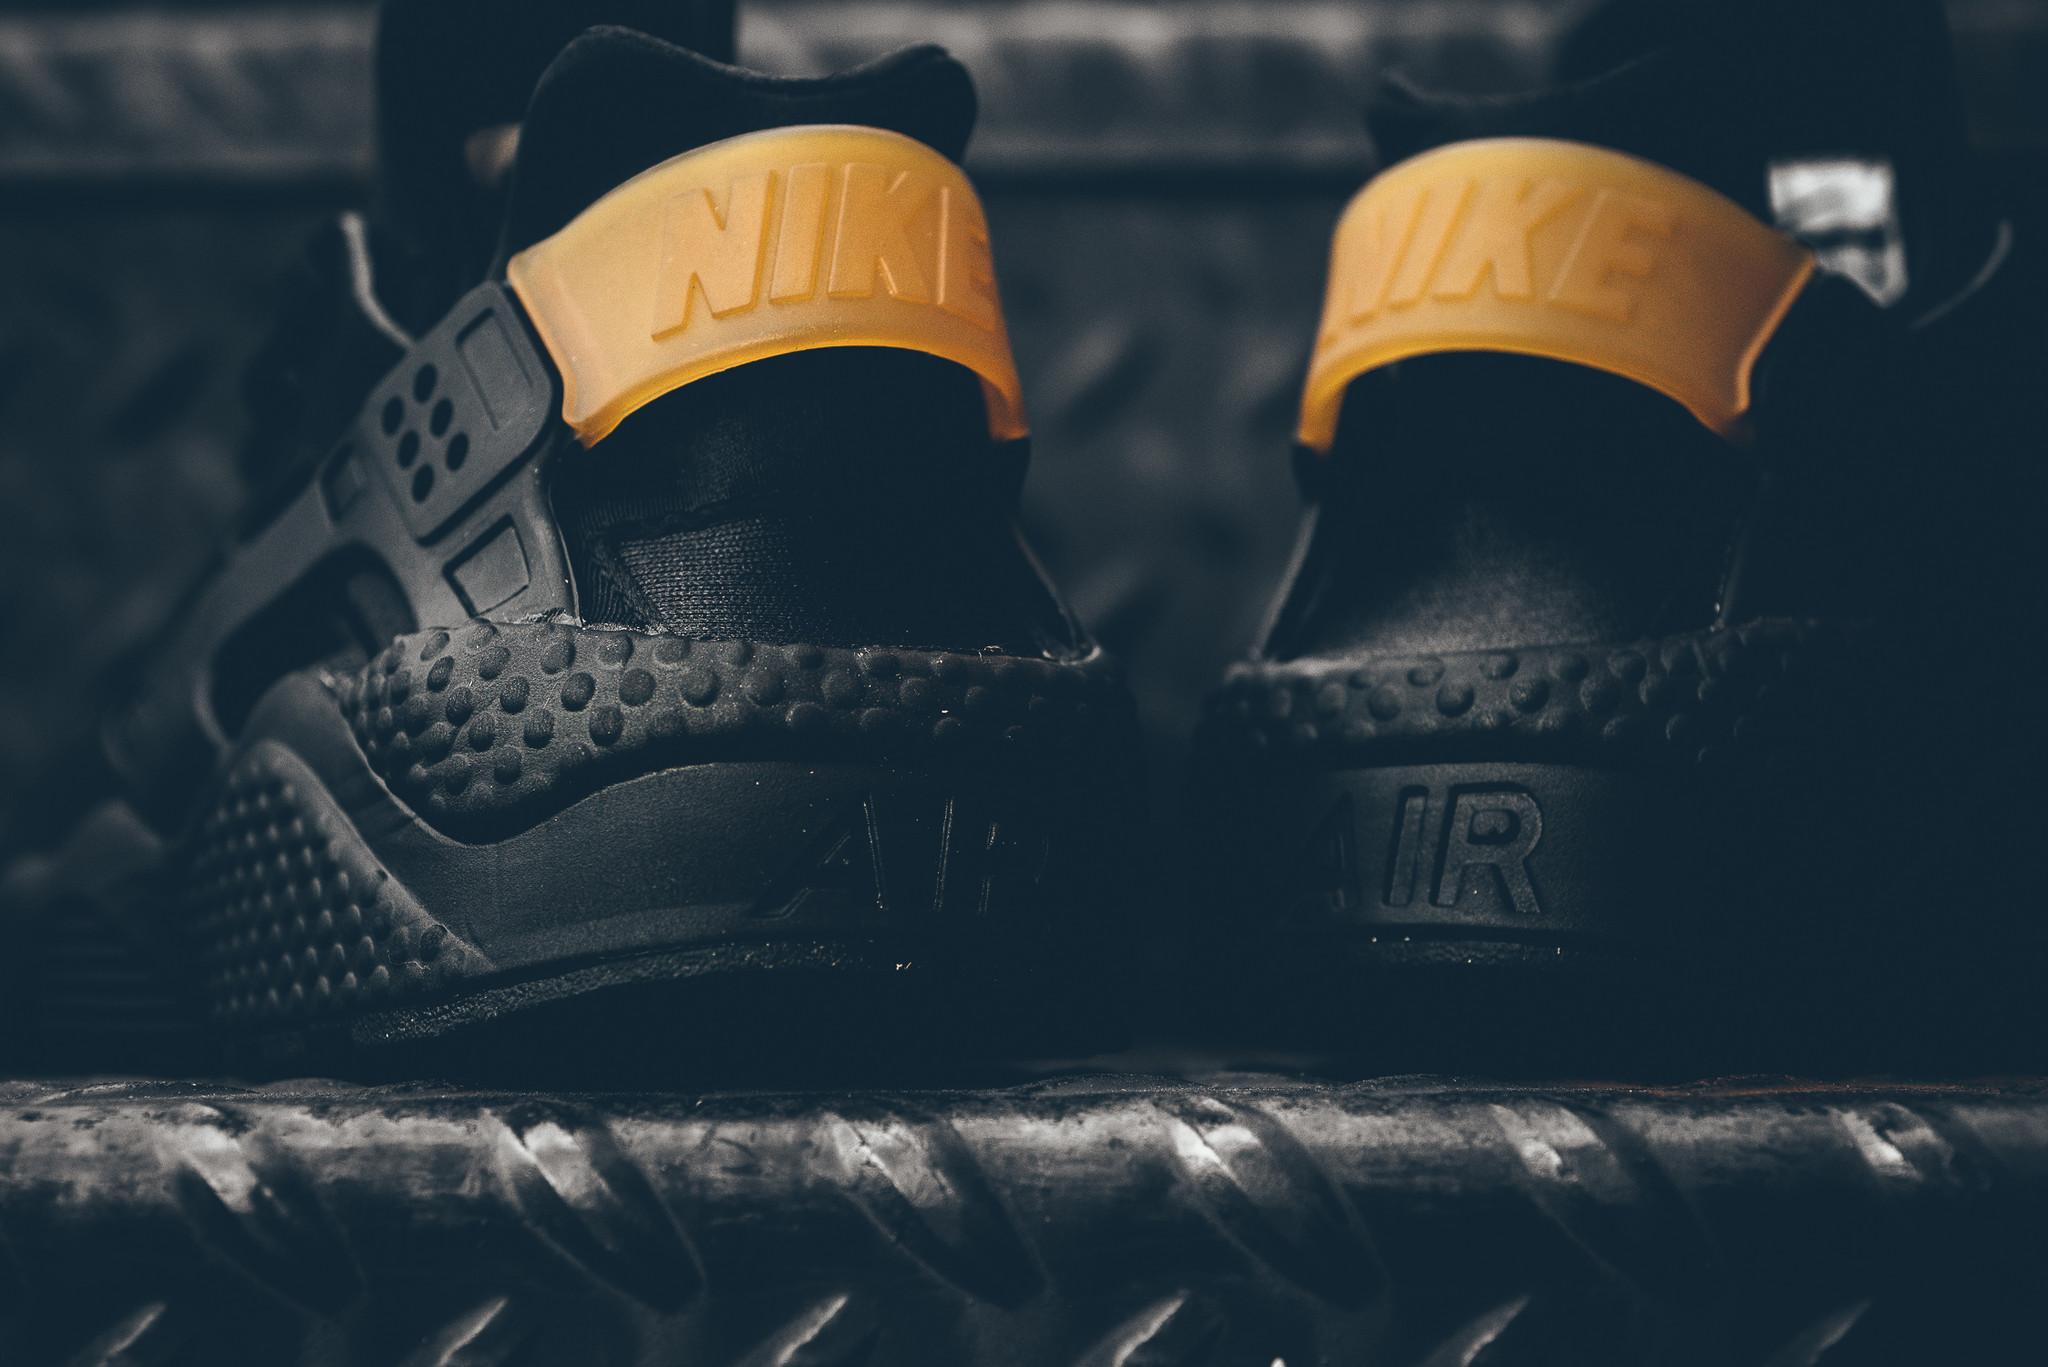 sneakers for cheap b8238 2a6b2 This Black   Metallic Gold Nike Air Huarache Is Available Now •  KicksOnFire.com